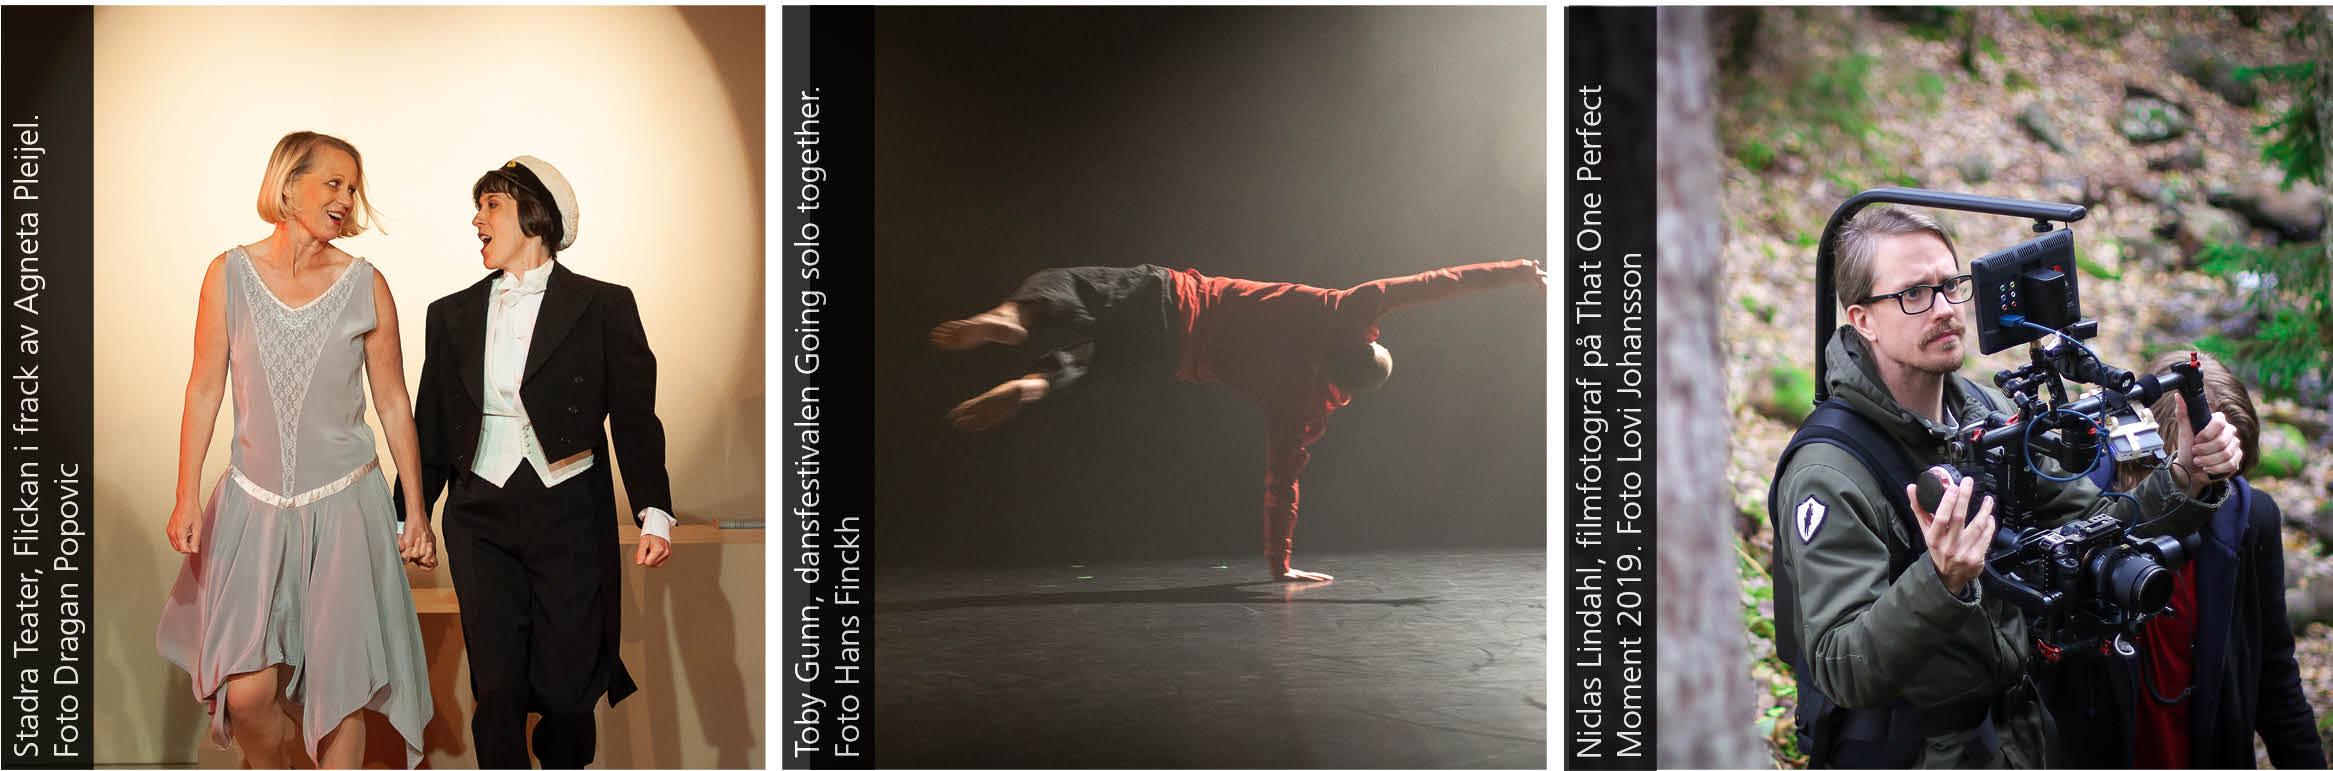 Flickan i frack - Stadra Teater, Toby Gunn - Going solo together, Niclas Lindahl, filmfotograf.